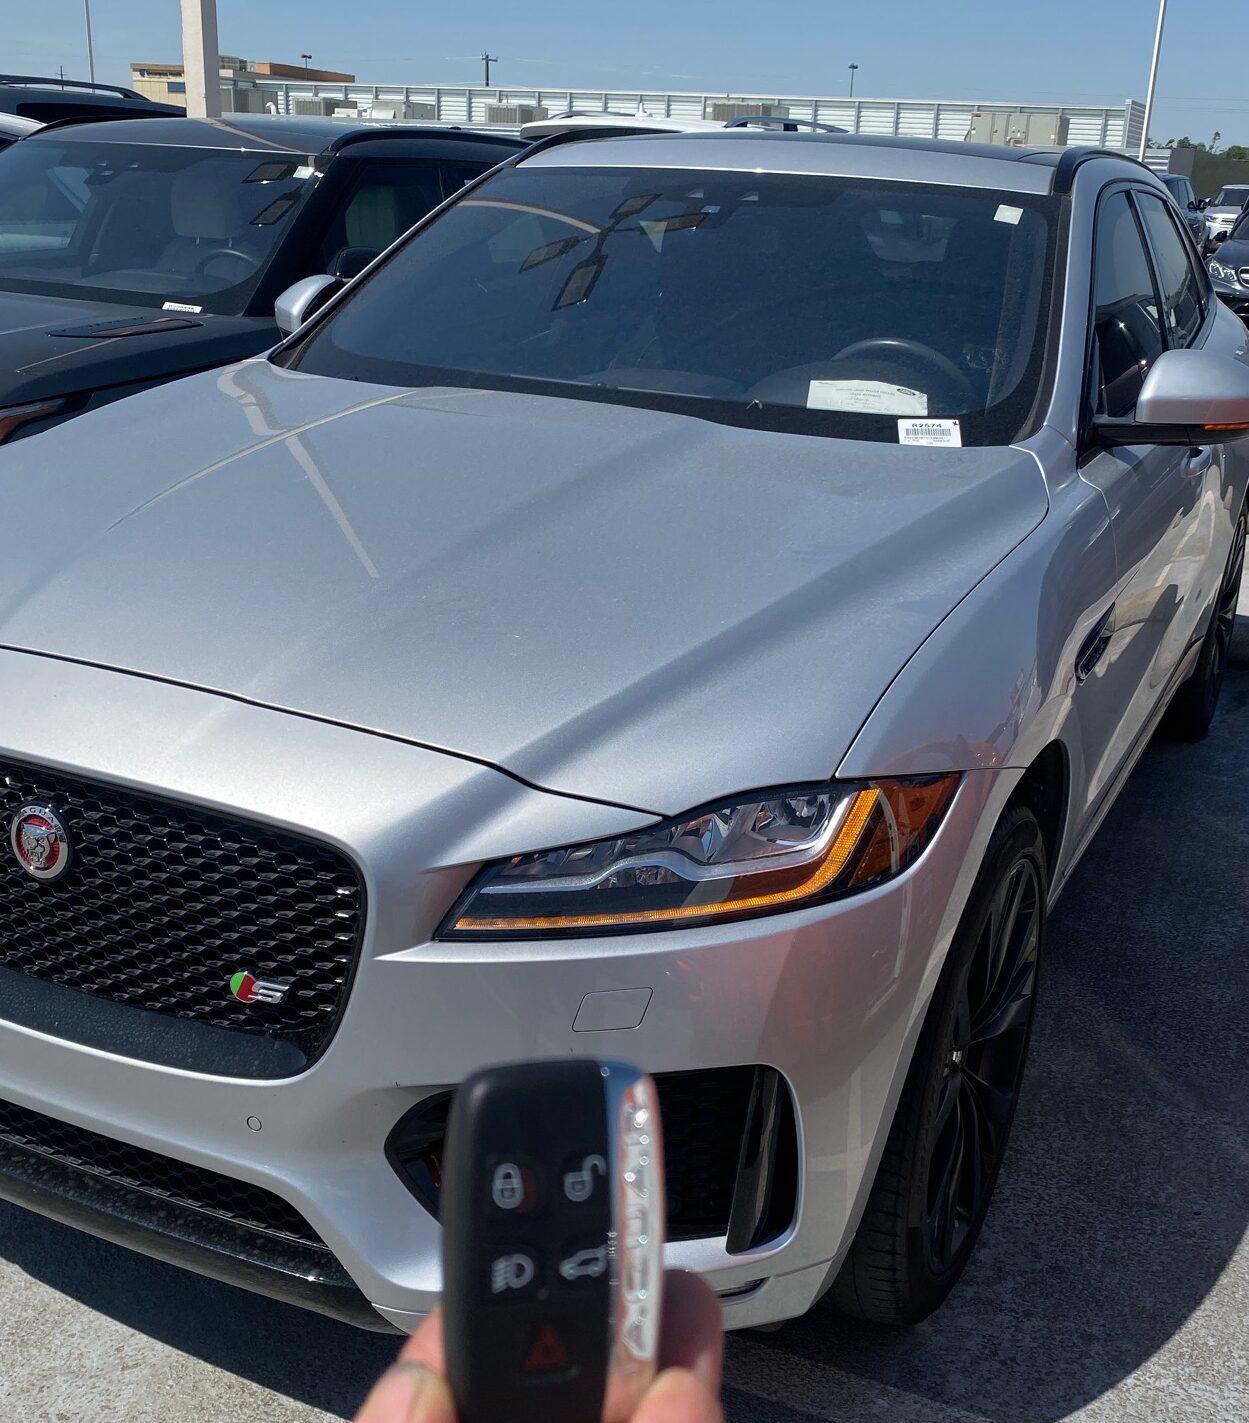 2017 Jaguar F-PACE smart key replacement with VVDI Prog and VVDI2.